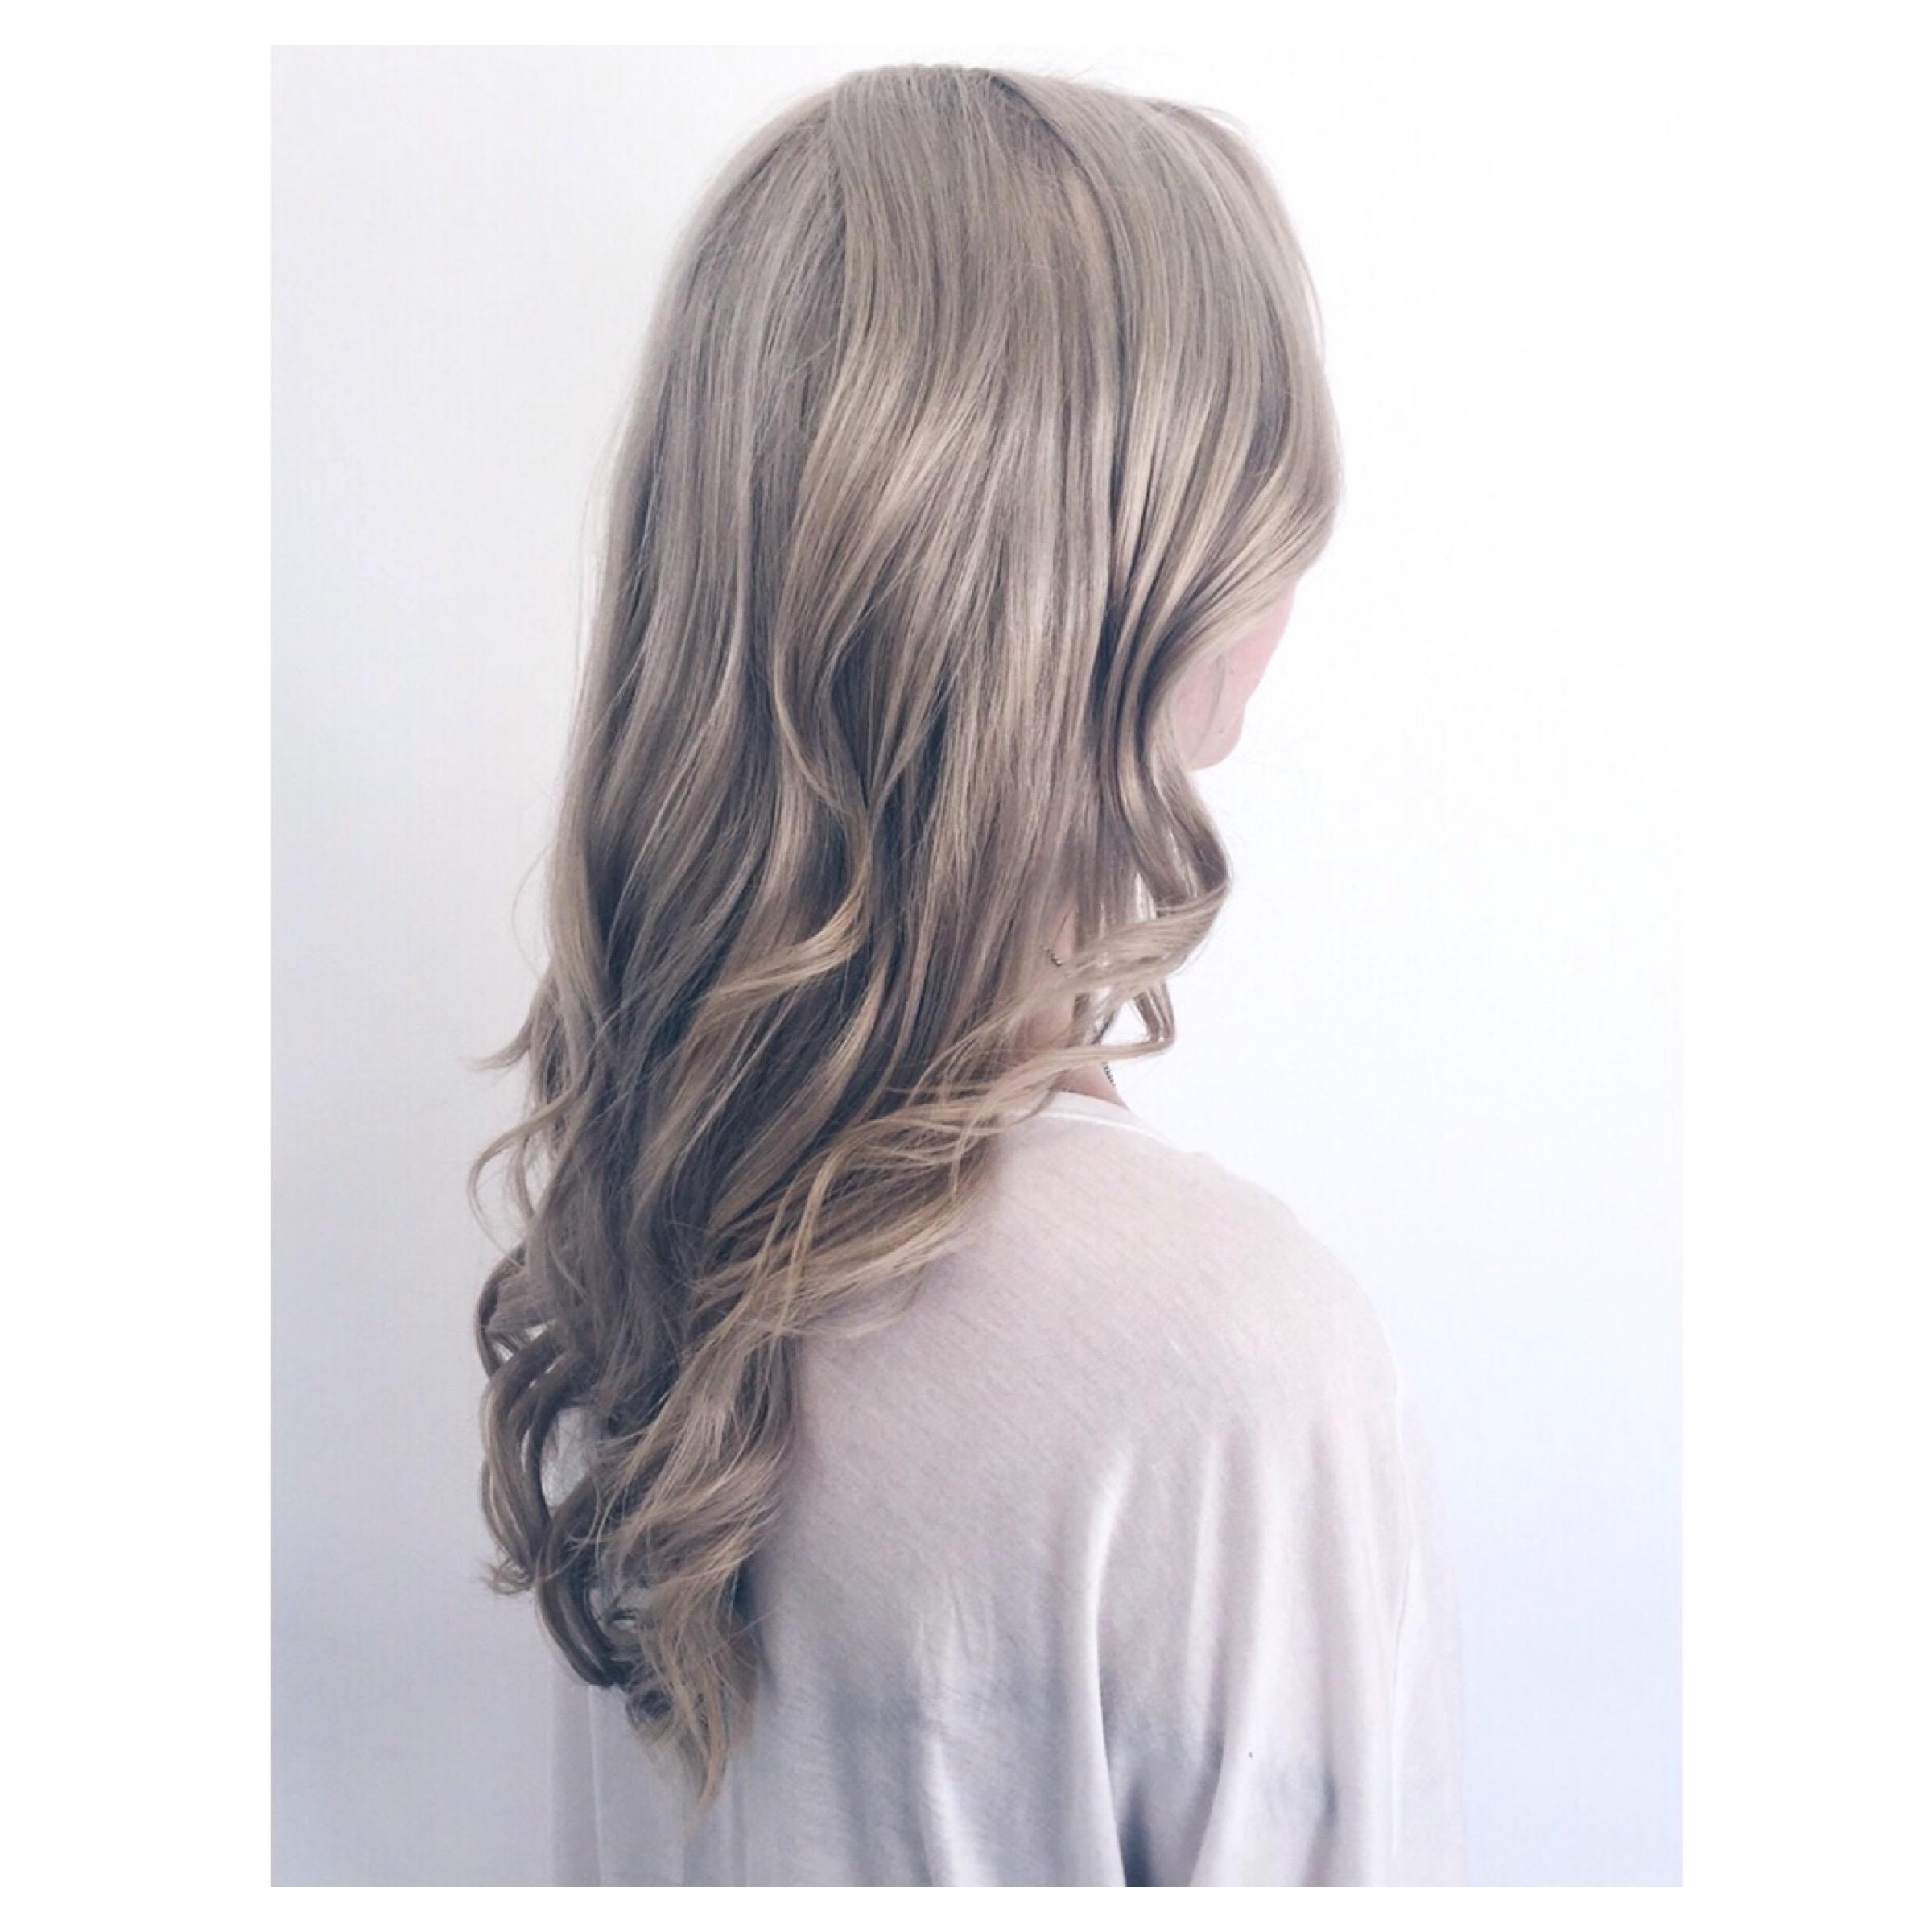 silver blonde hair yots hair. Black Bedroom Furniture Sets. Home Design Ideas